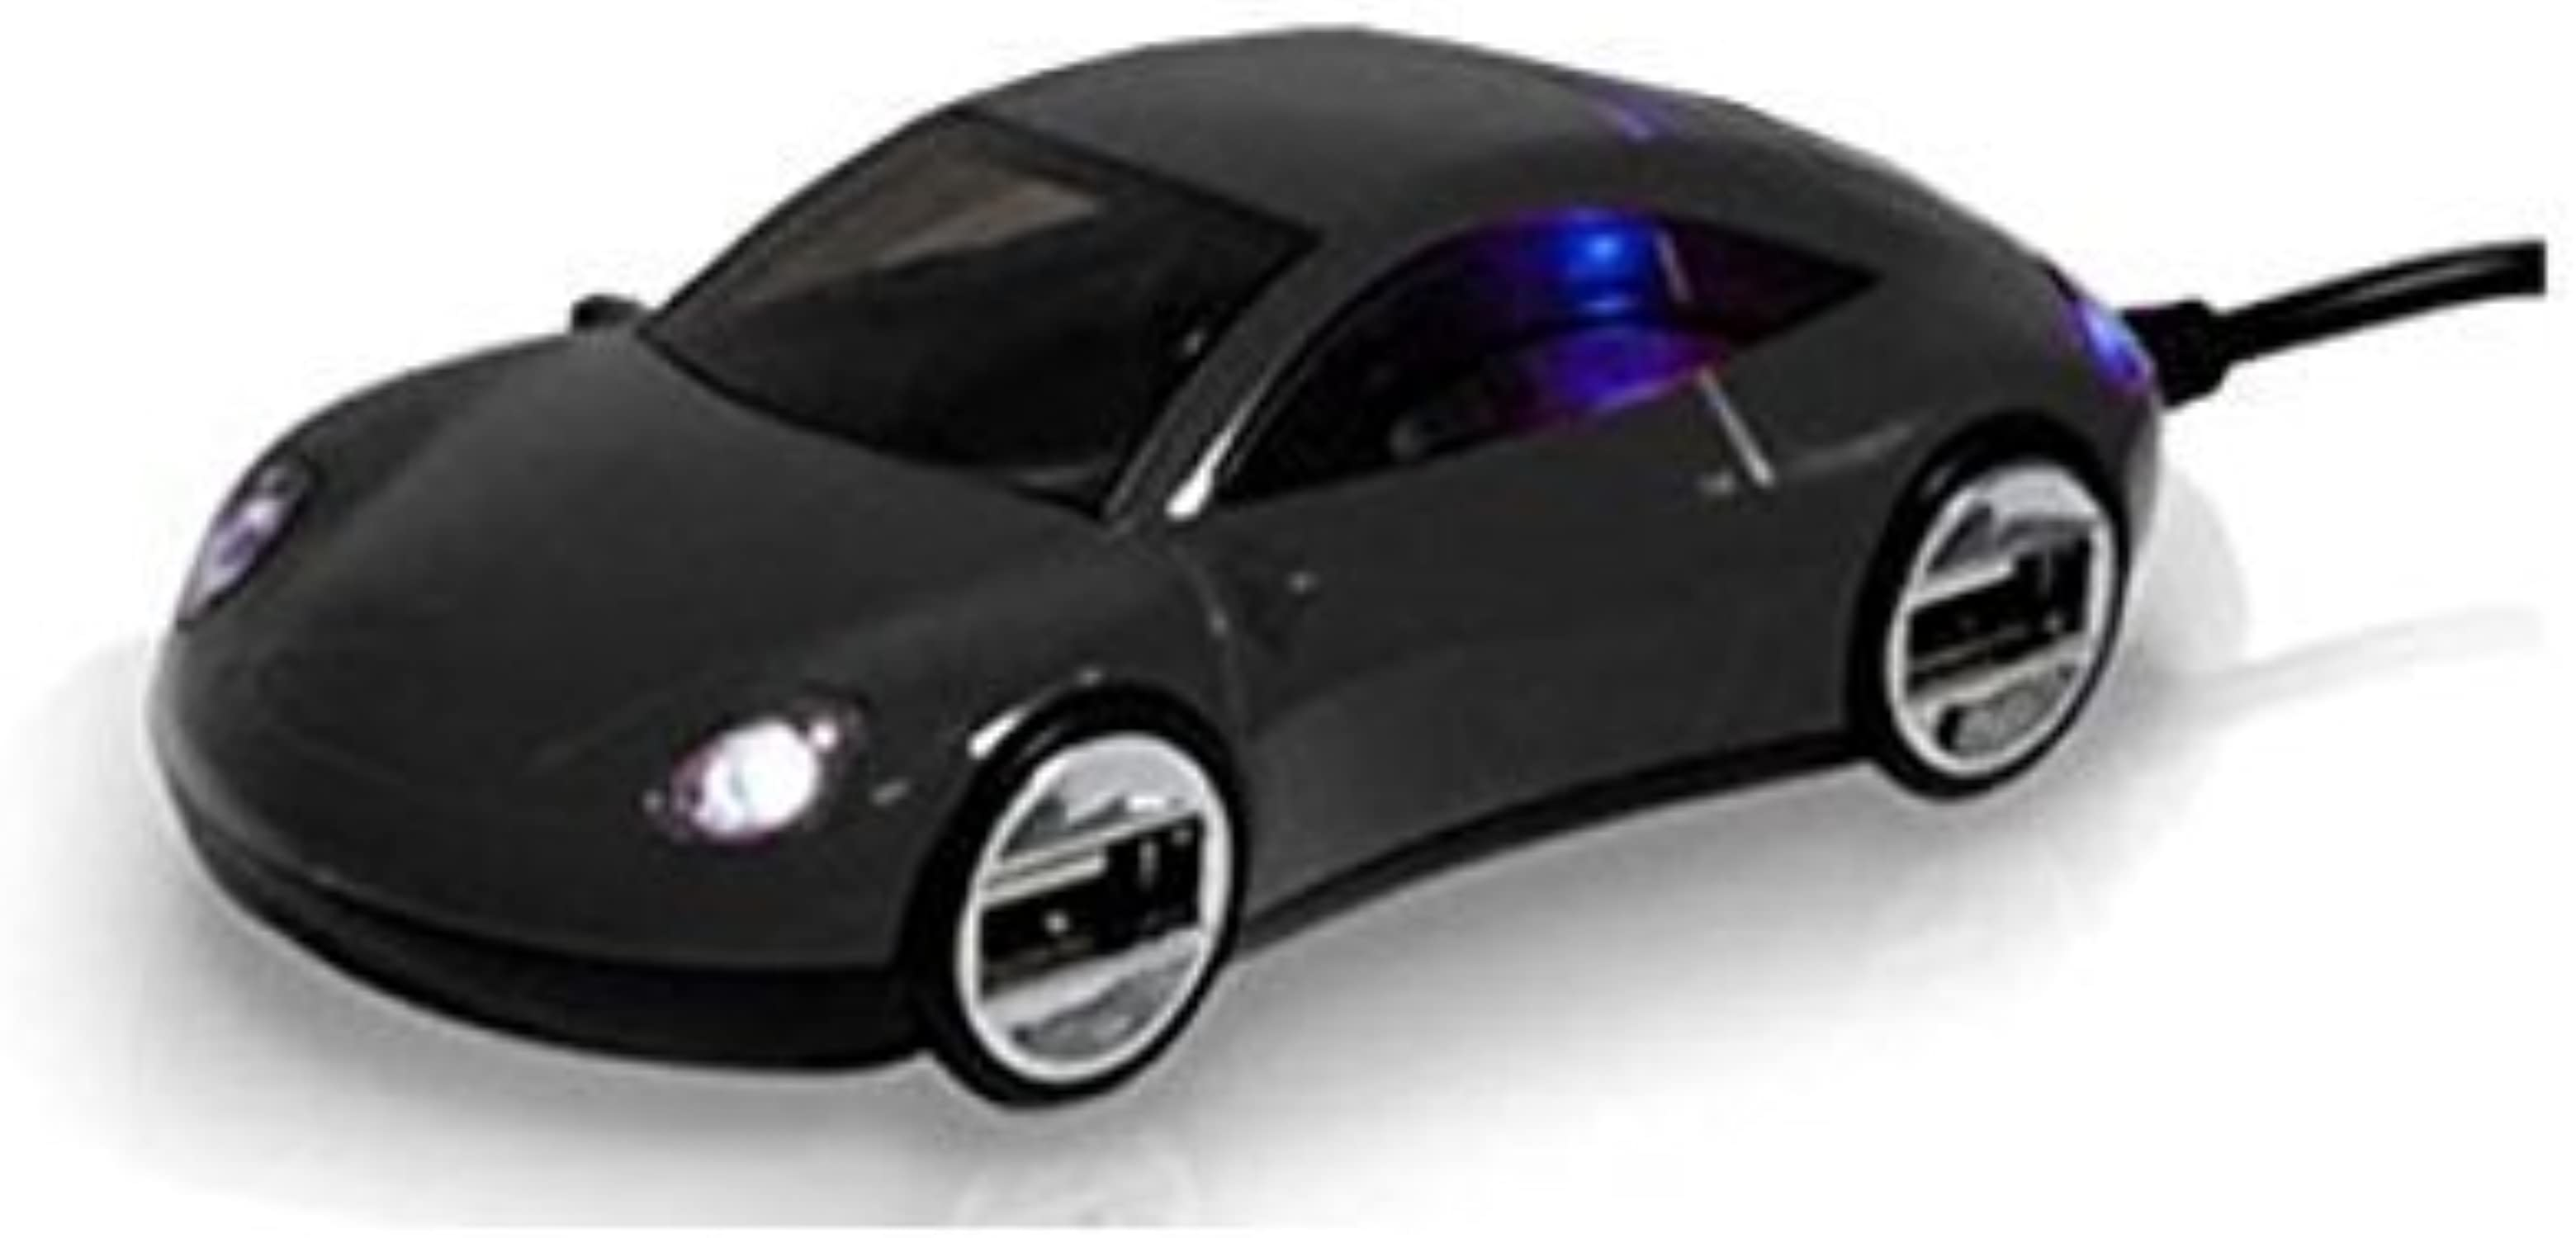 muy popular Light Up Sleek negro Race Car 4 4 4 Port USB 2.0 Hub Accessory by Kito  almacén al por mayor